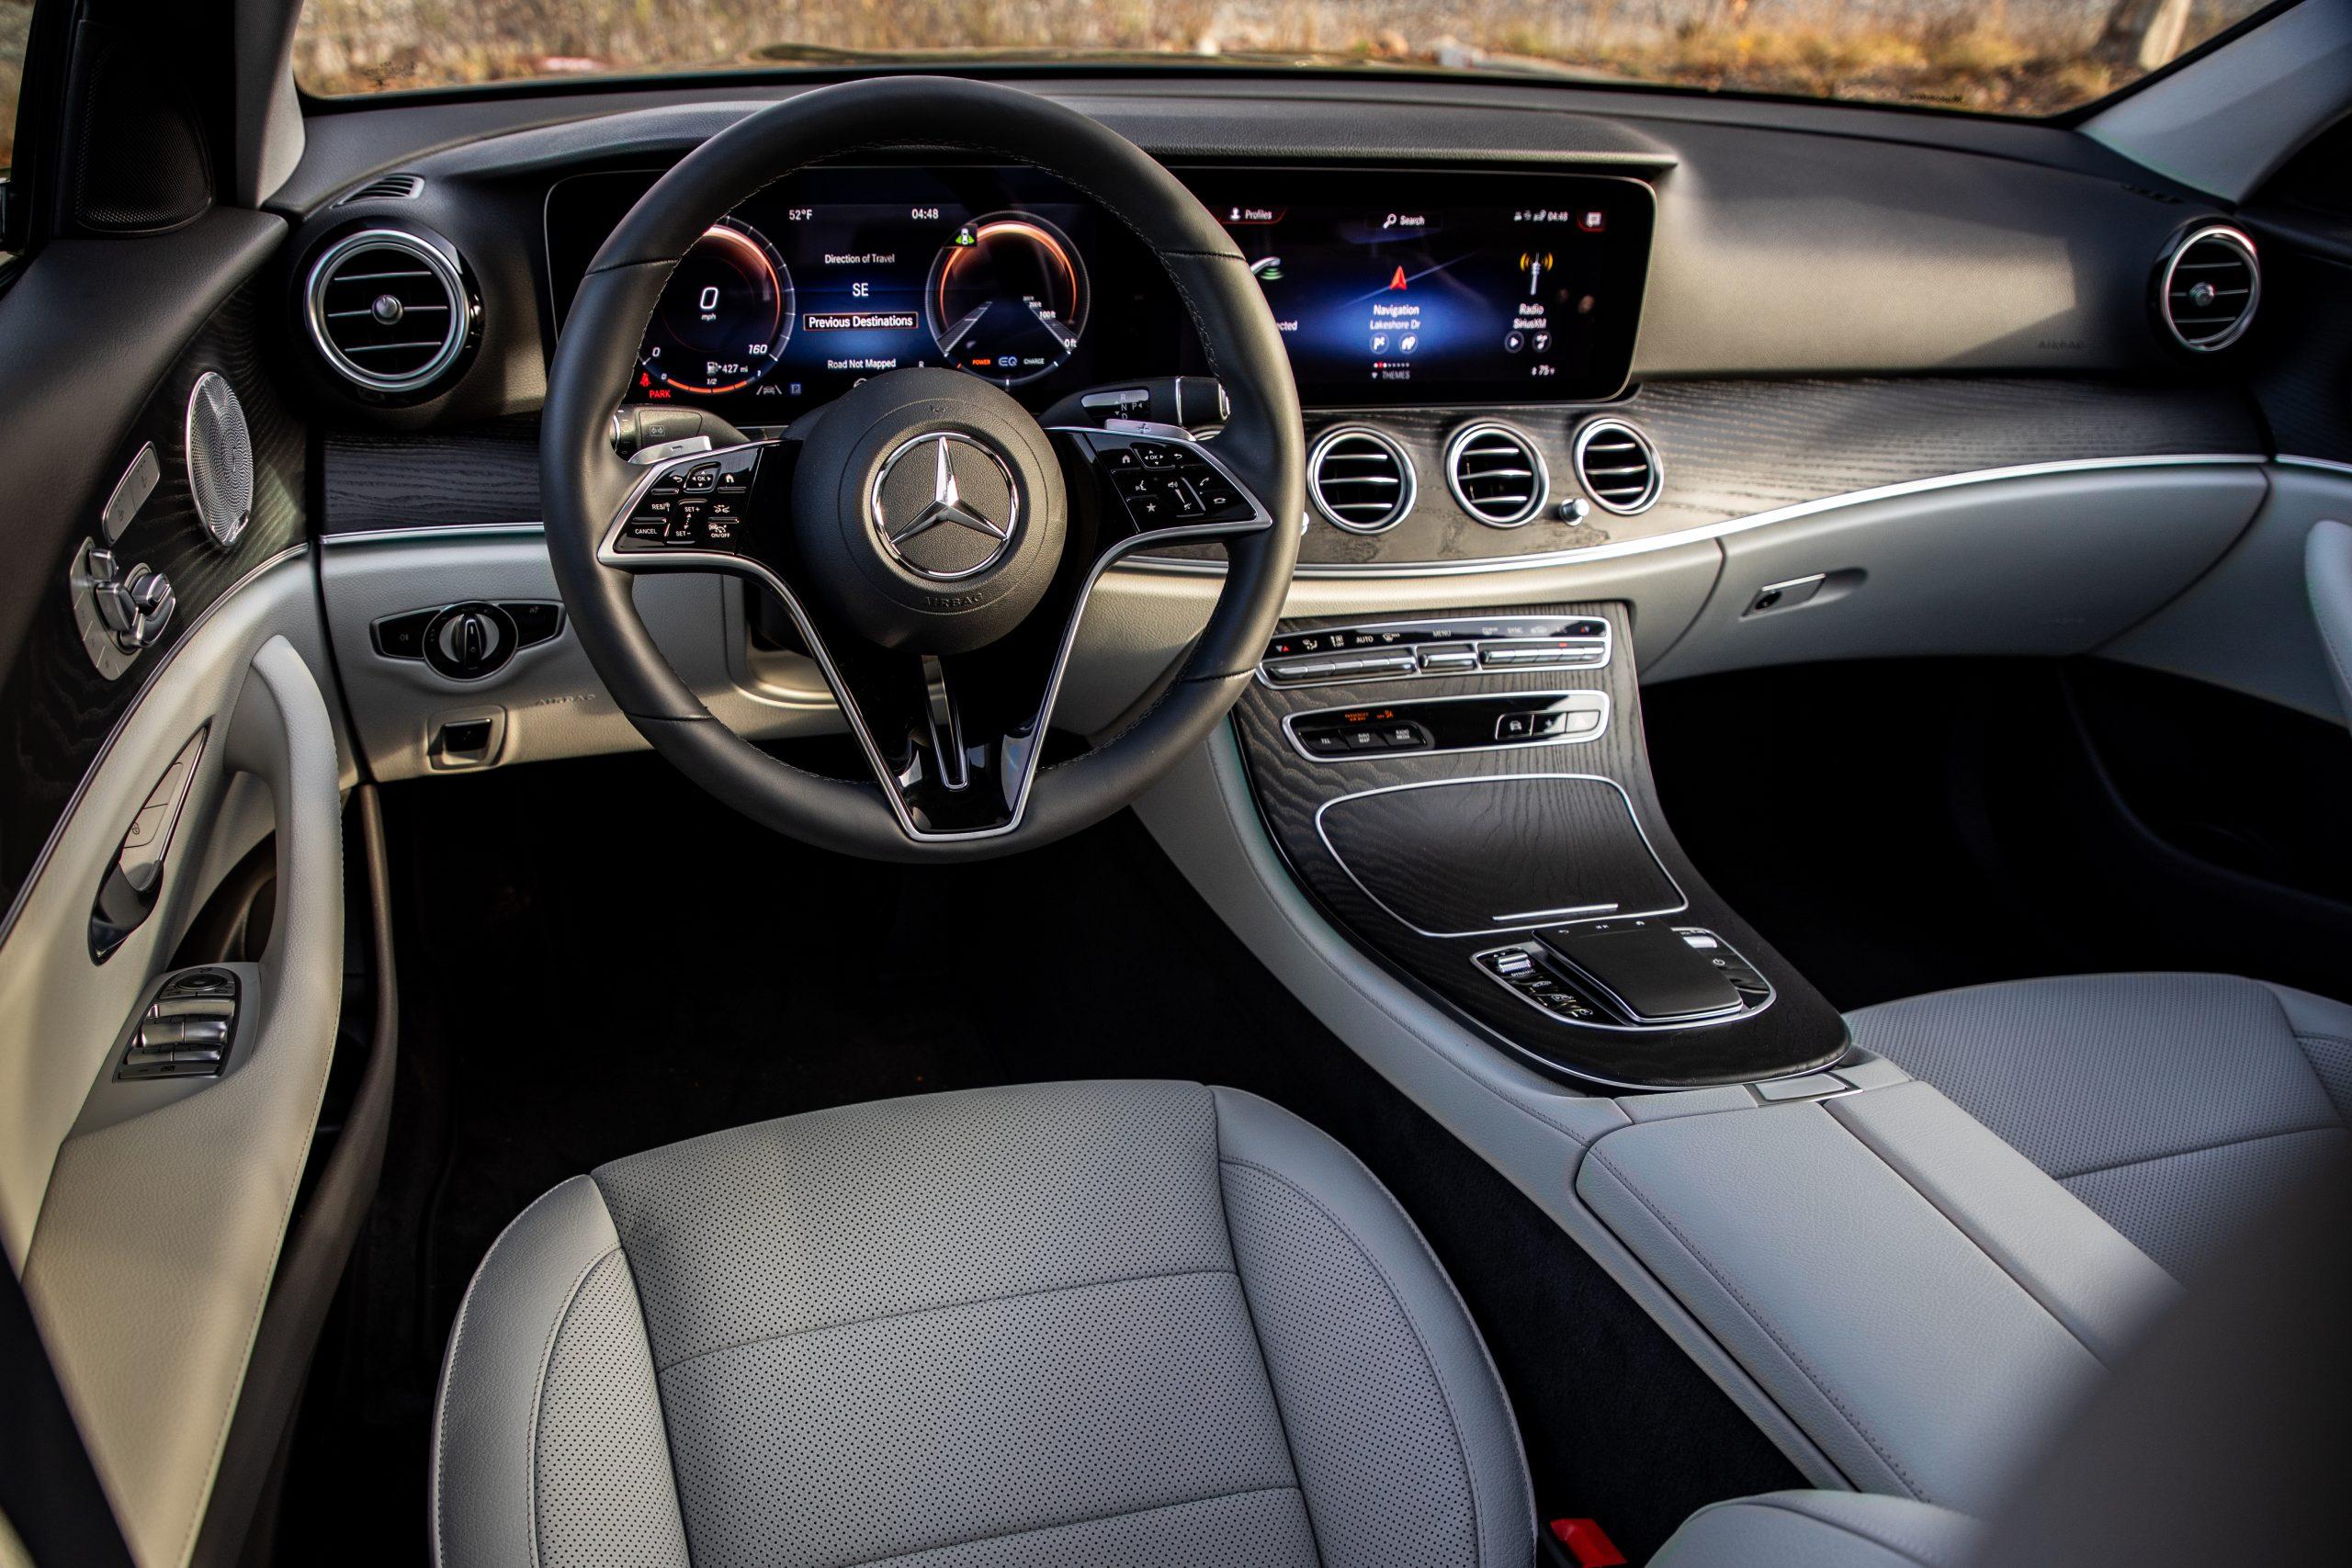 2021 Mercedes Benz E 450 4MATIC cabin interior